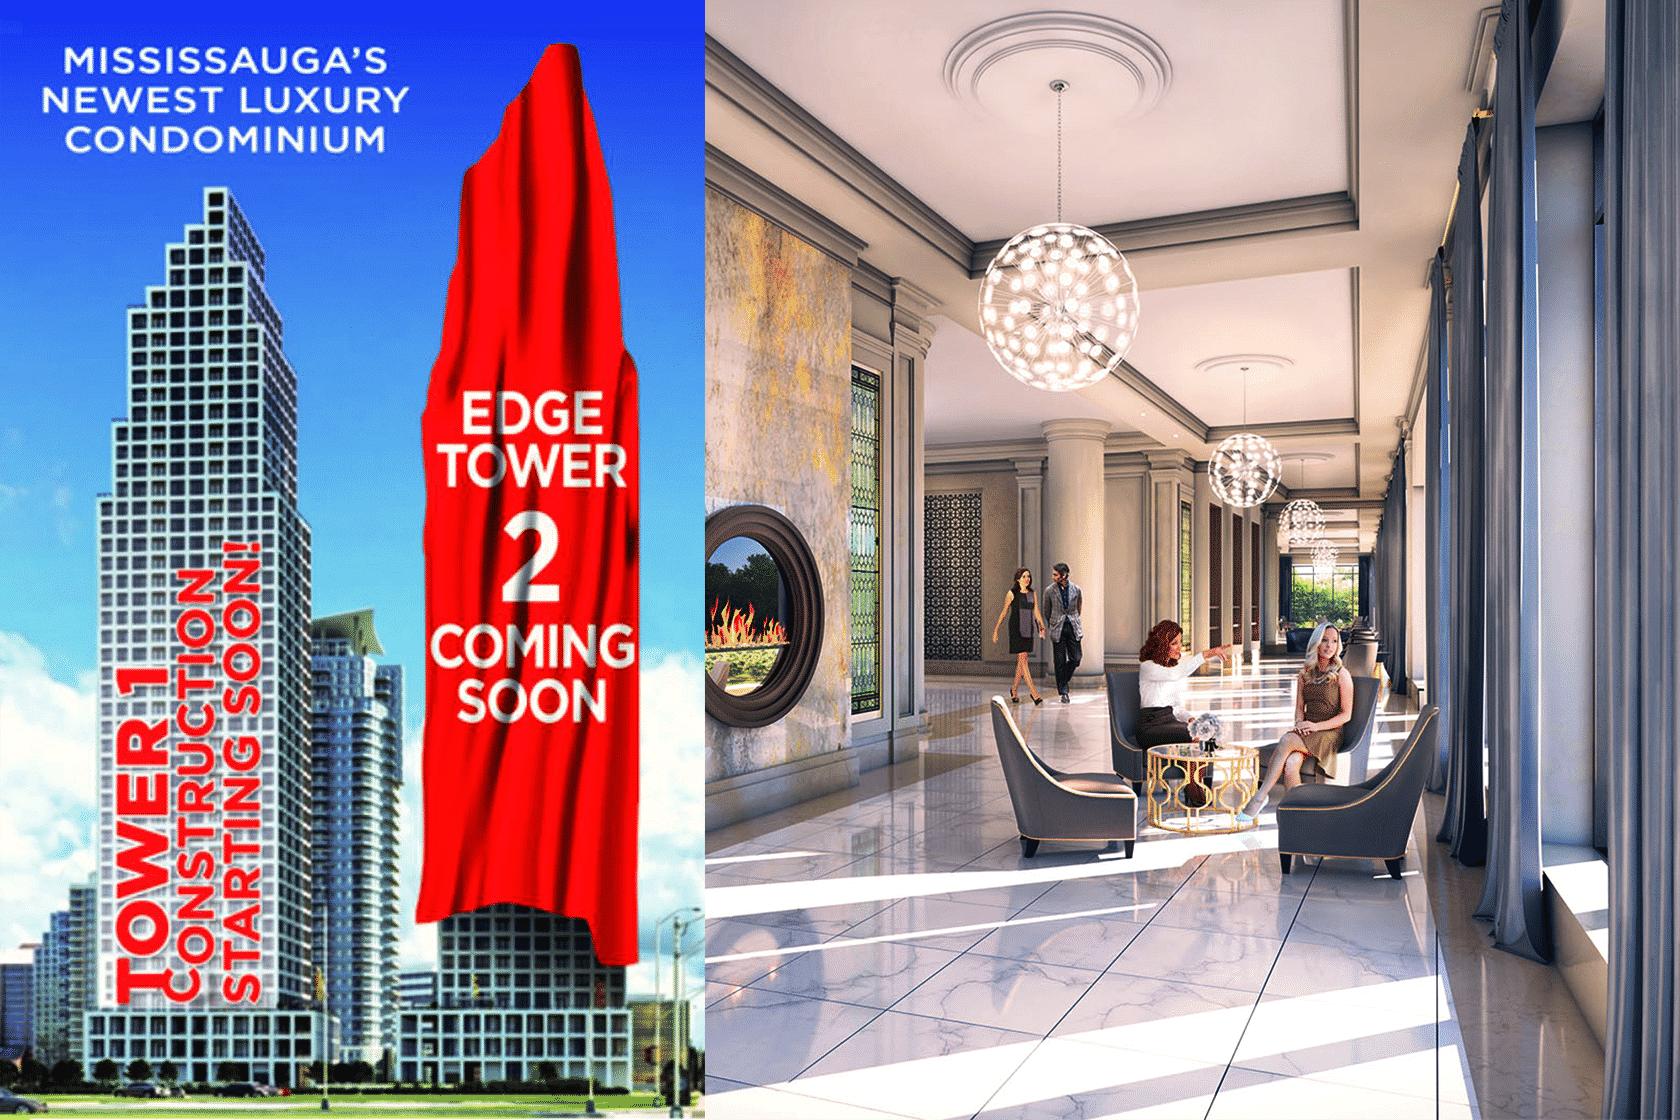 cooksville go Edge Tower 2 Condos edge tower 2 edge condos tower 2 mississauga edge condos for sale